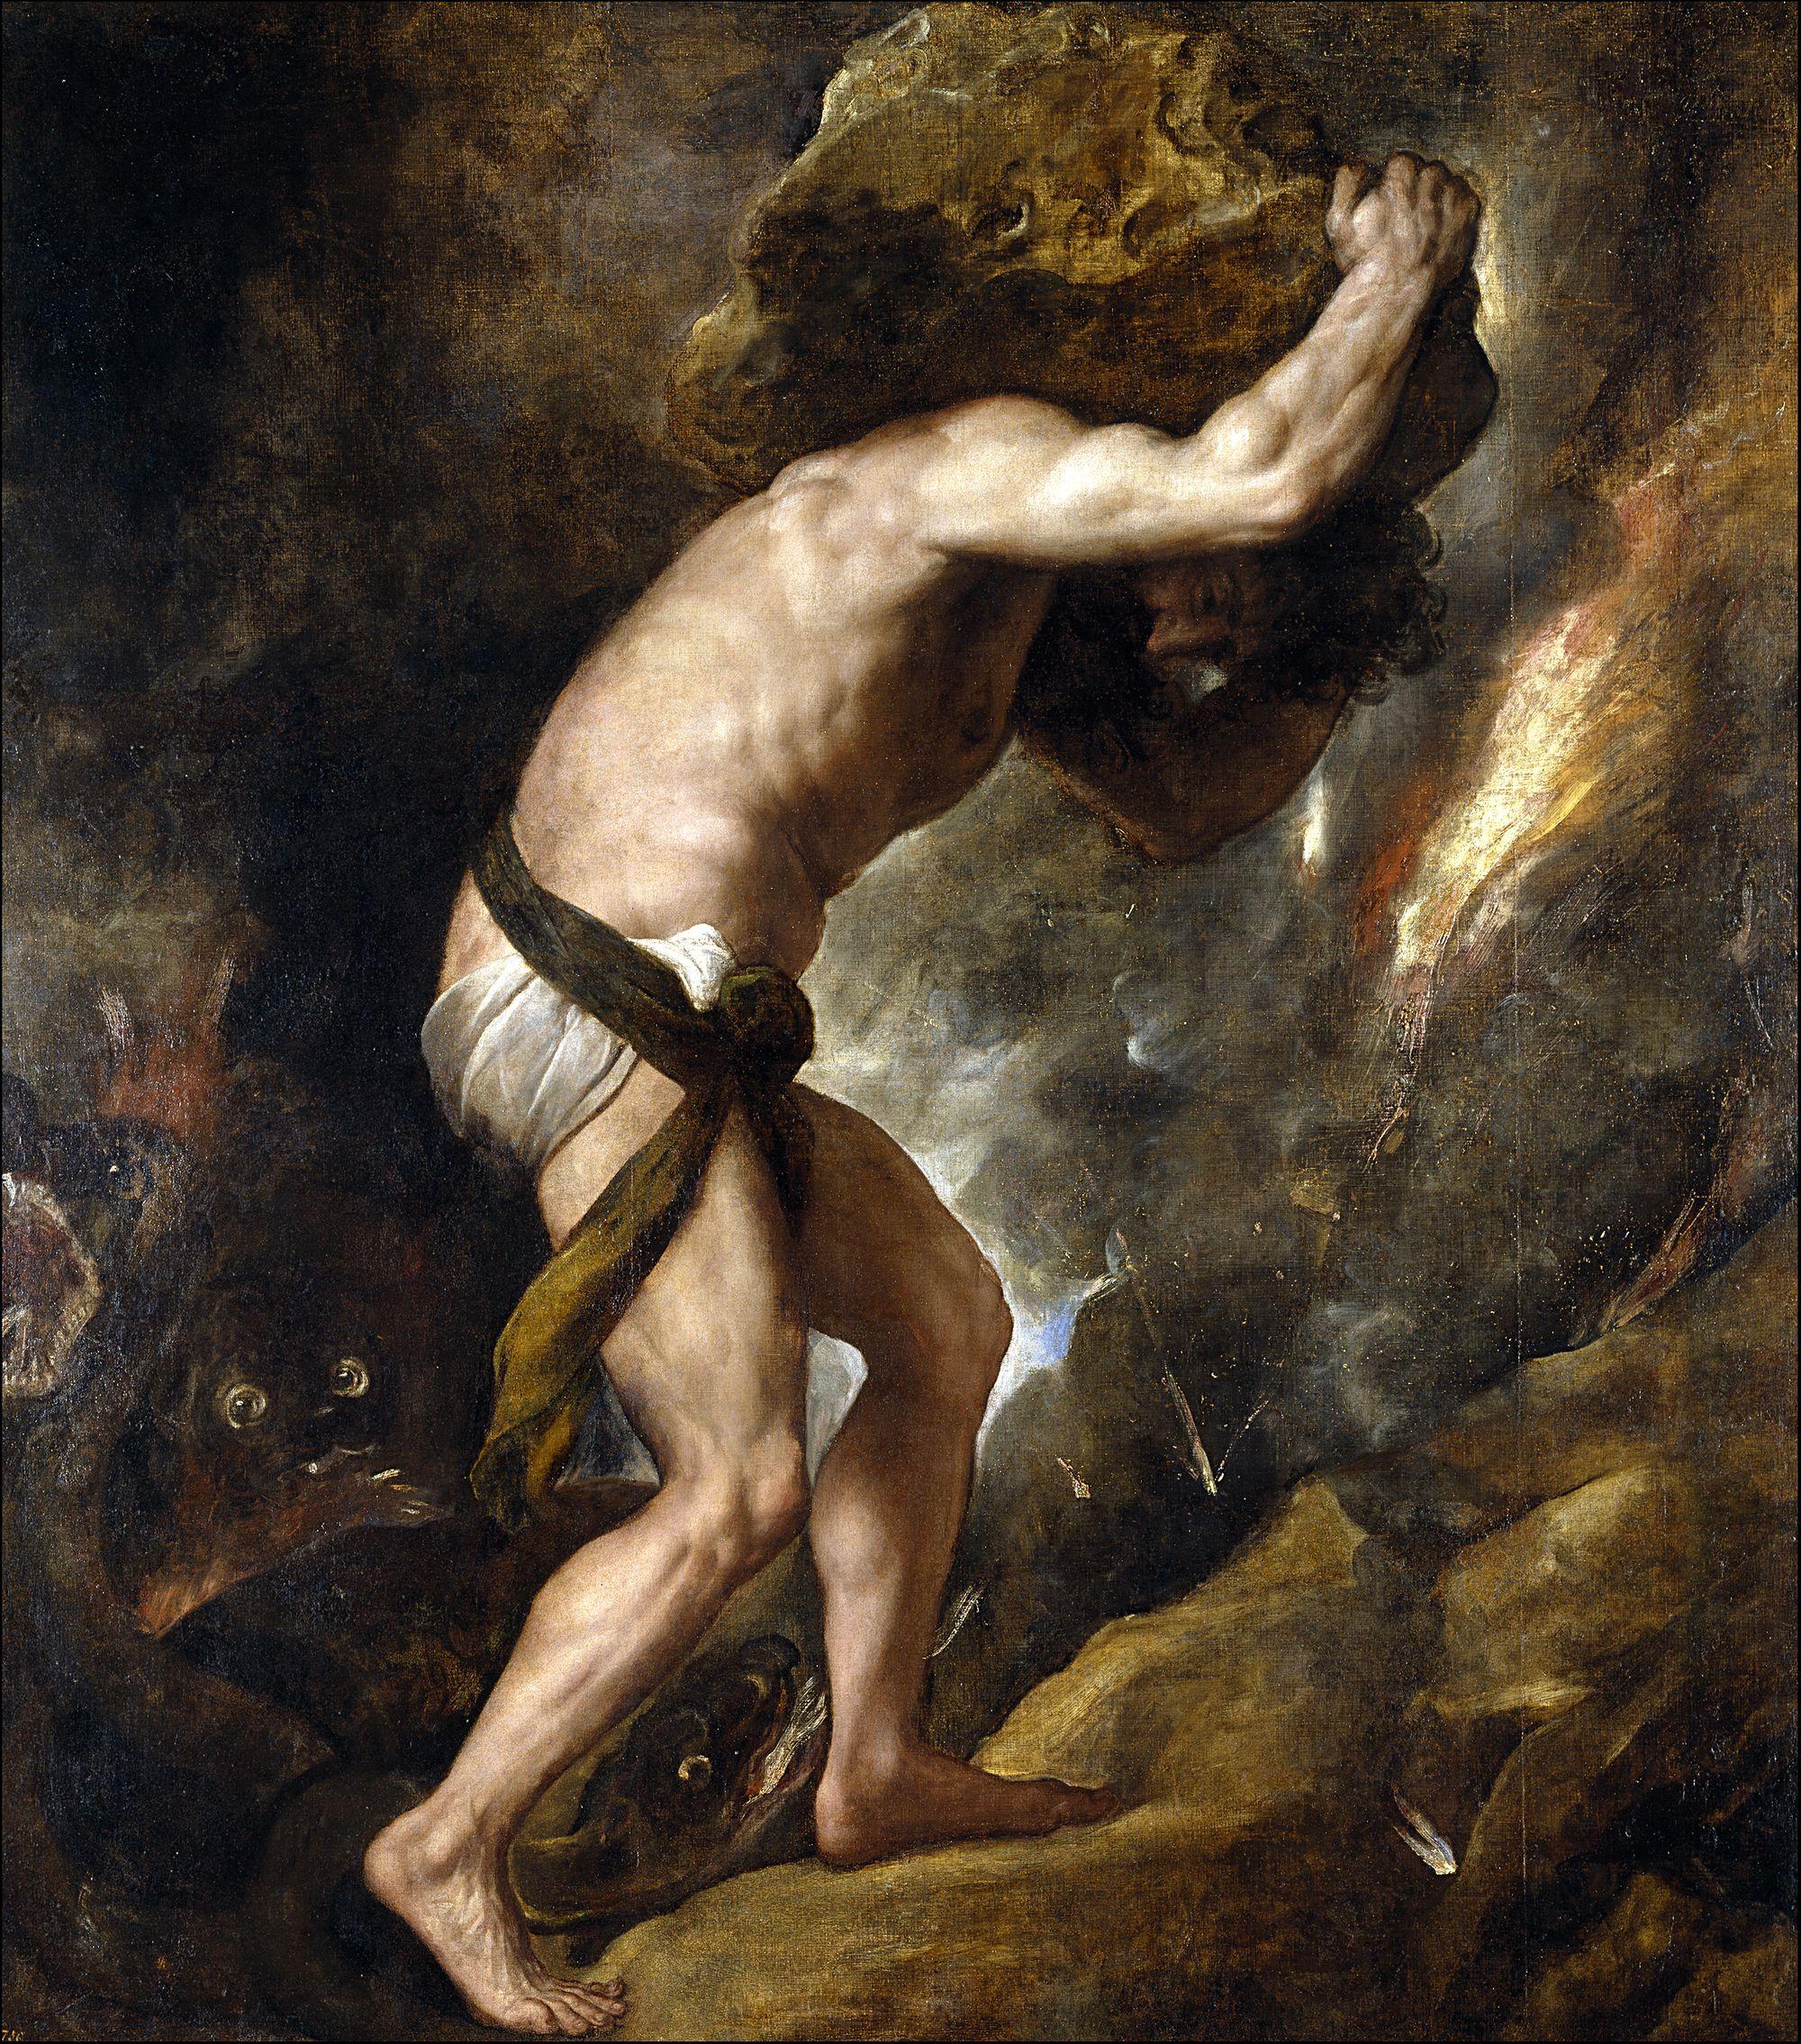 Painting of sisyphus